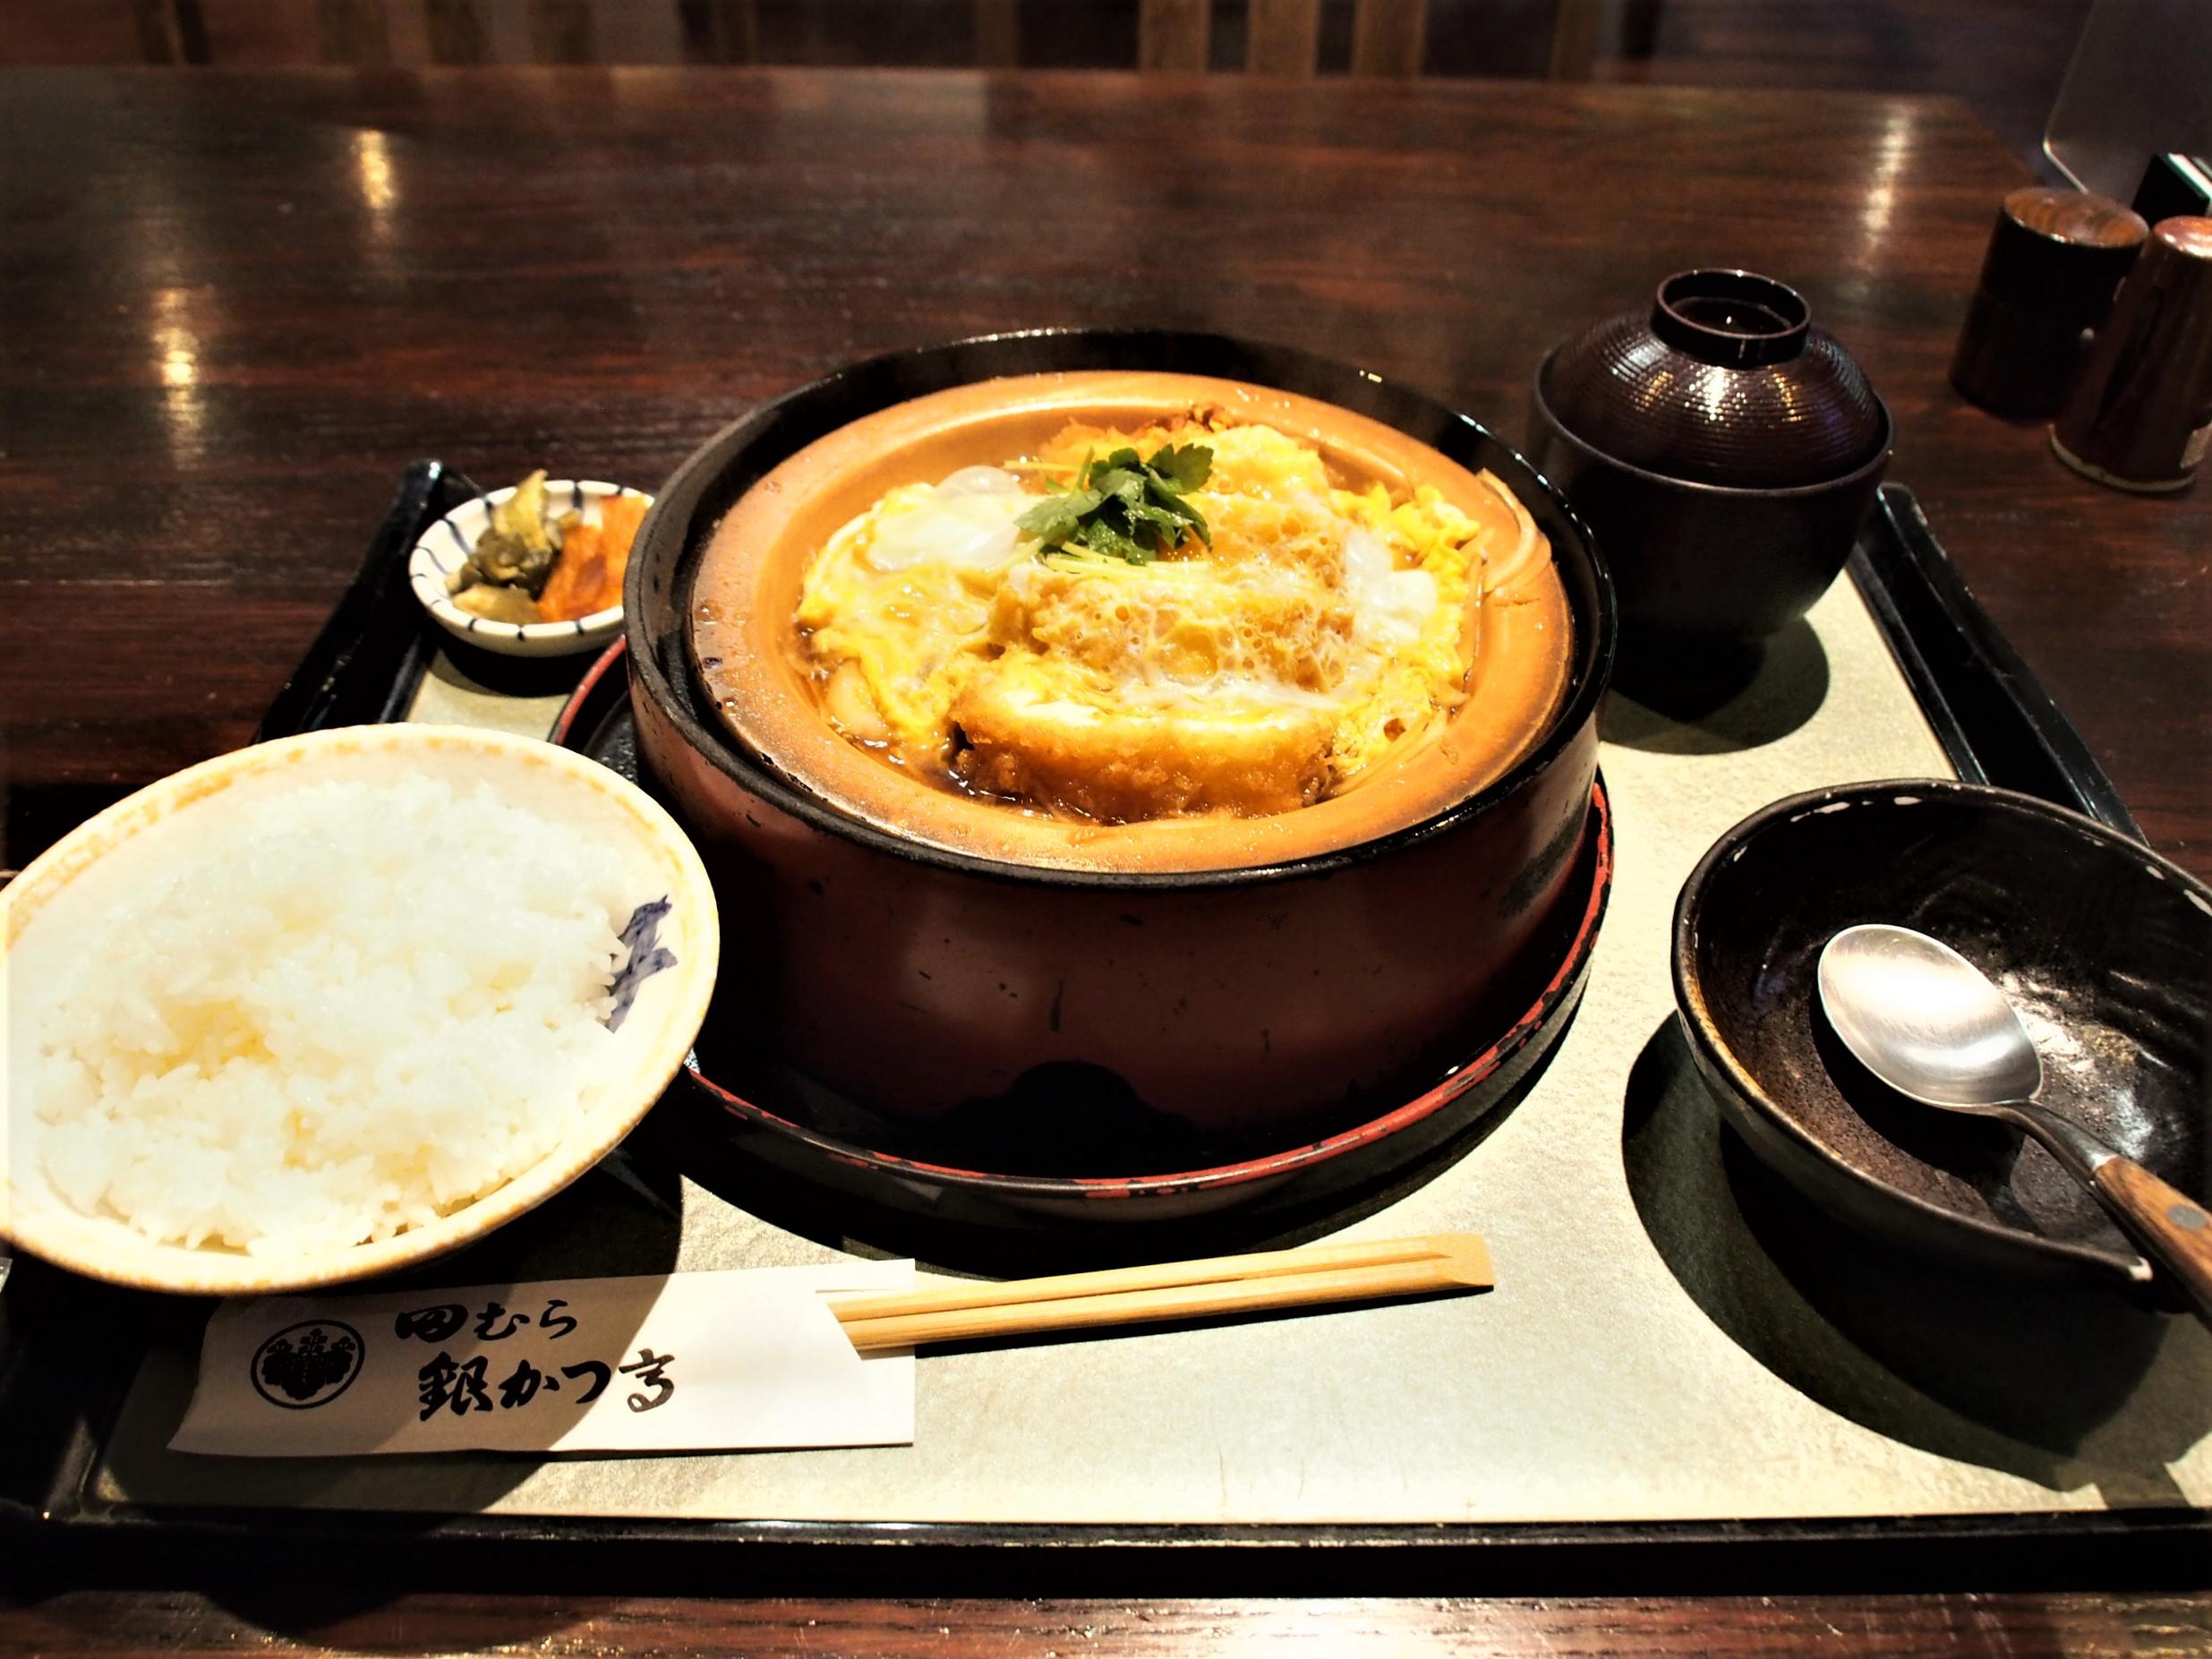 箱根強羅名物の銀豆腐